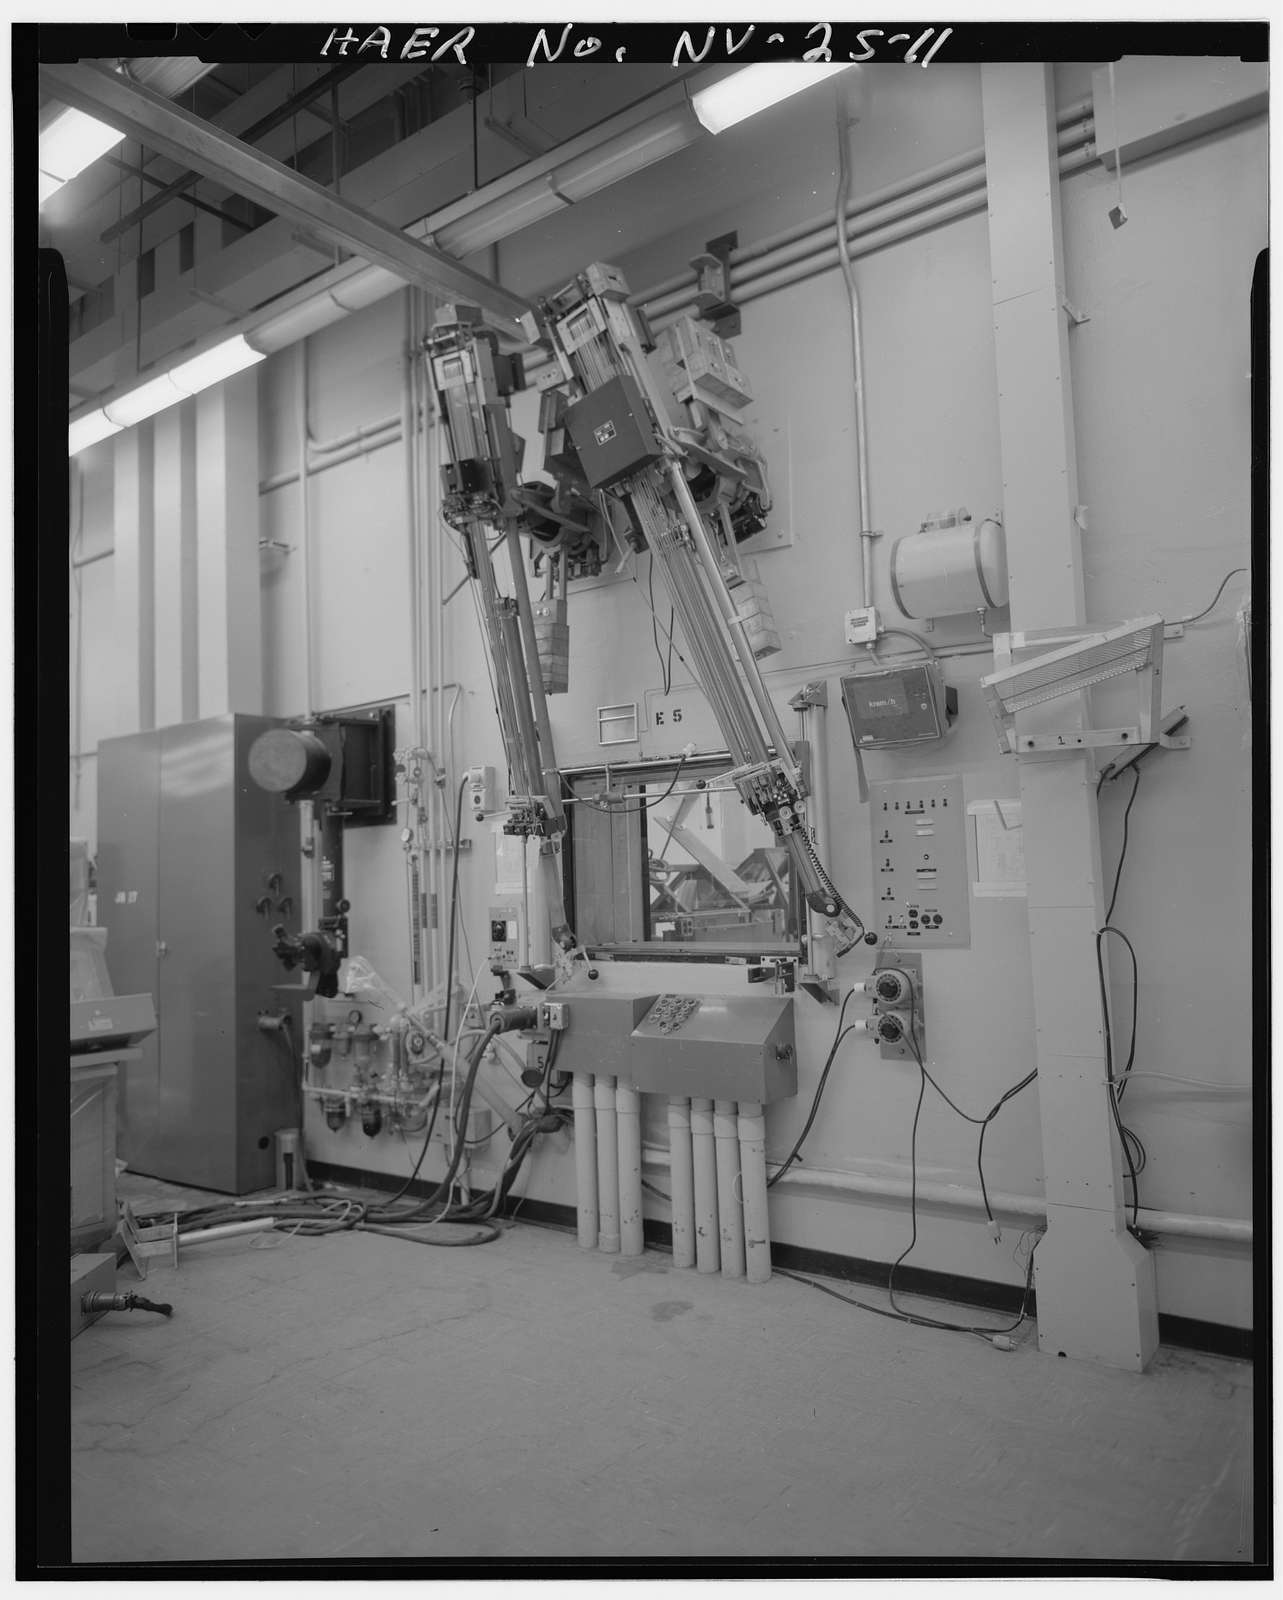 Nevada Test Site, Engine Maintenance Assembly & Disassembly Facility, Area 25, Jackass Flats, Mercury, Nye County, NV